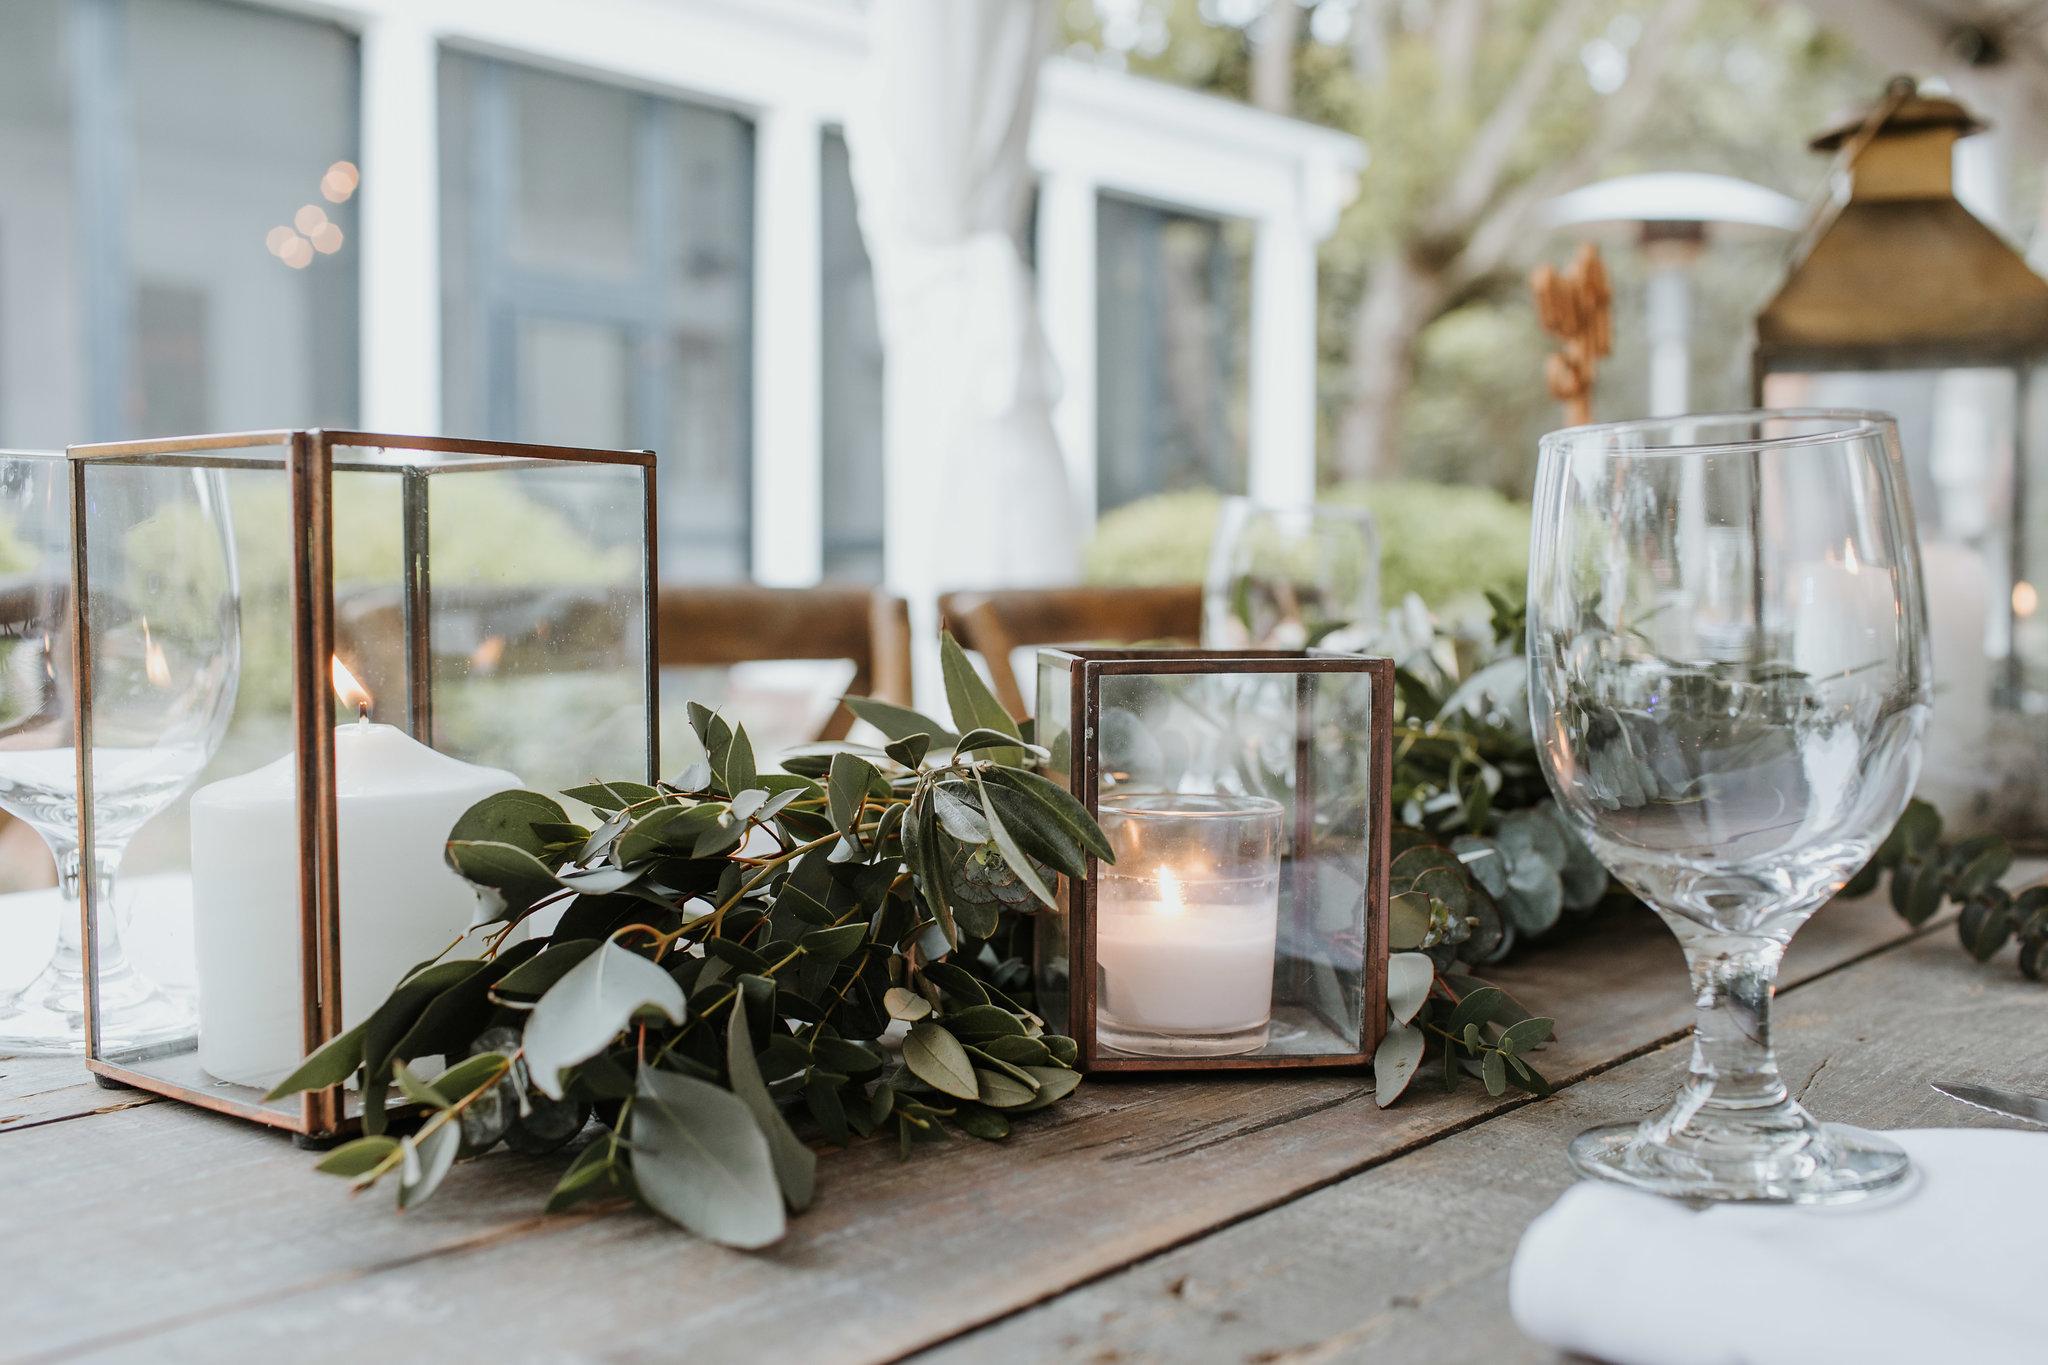 Legare-Waring-House-Charleston-SC-wedding-portrait-photography-377.jpg